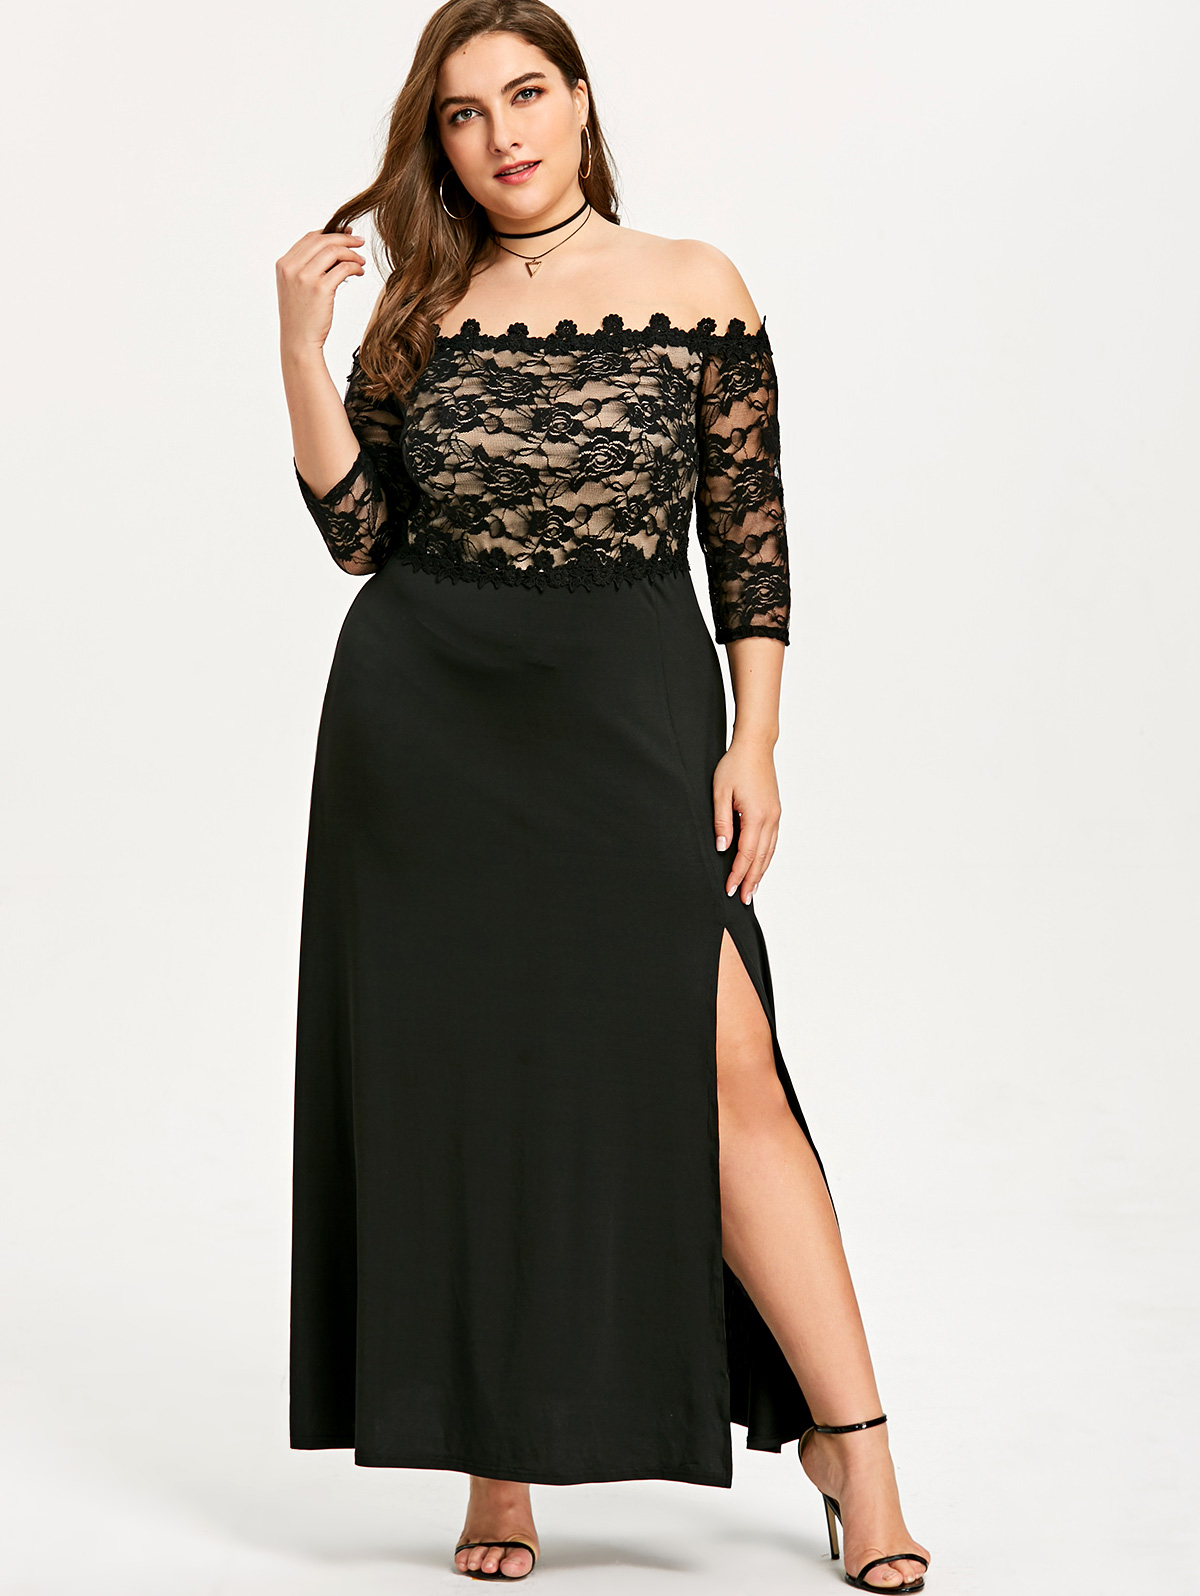 Gamiss Plus Size Slit Off Shoulder Maxi Dress Women 3/4 ...